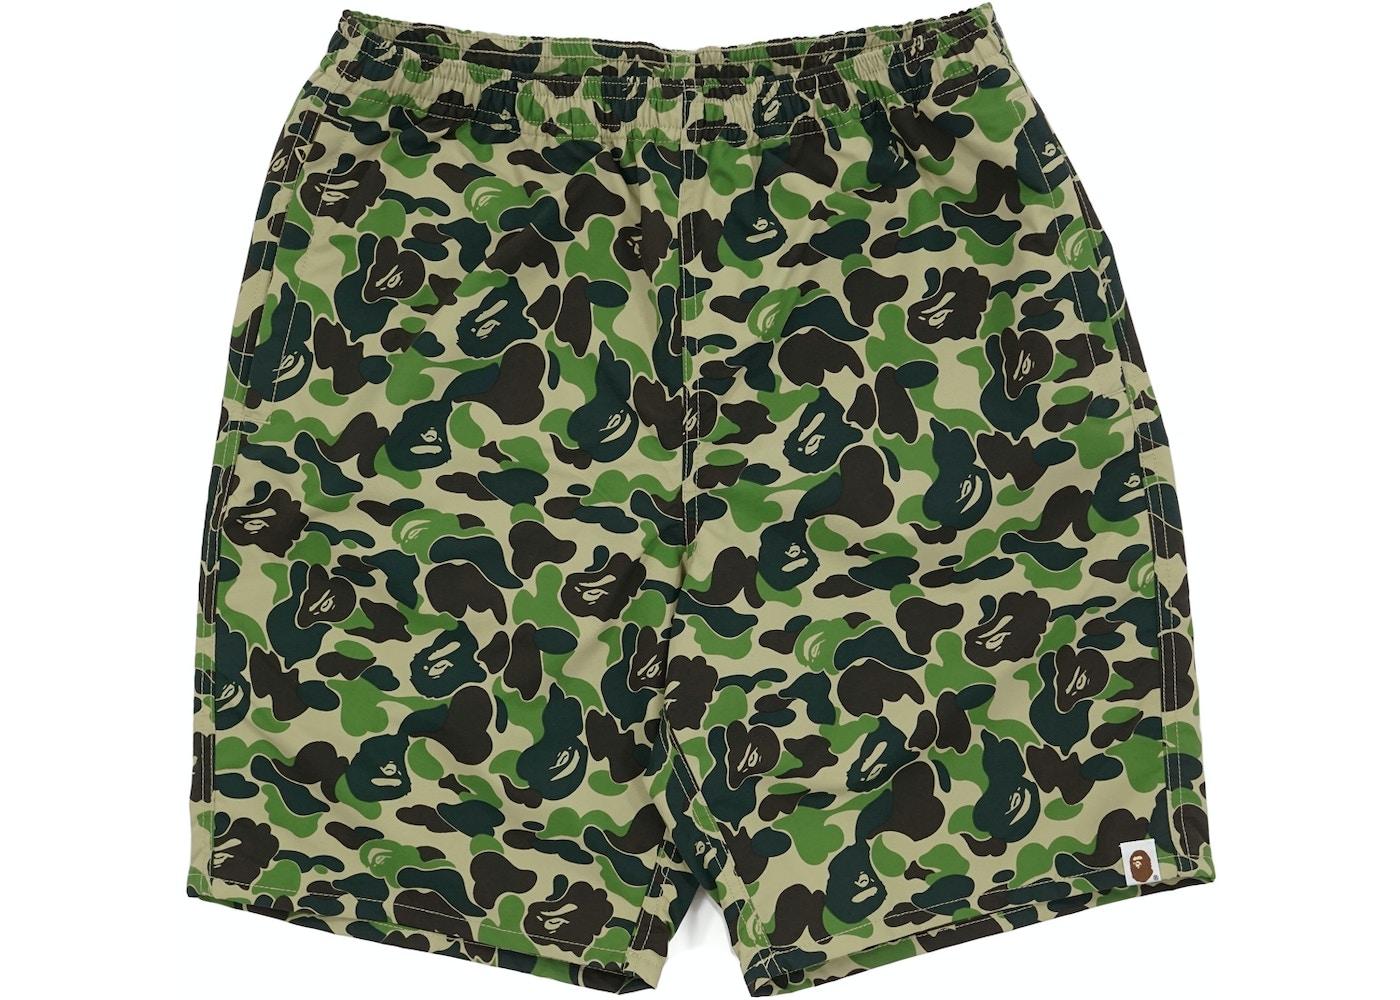 73e94ada8d BAPE ABC Camo Beach Shorts Green -